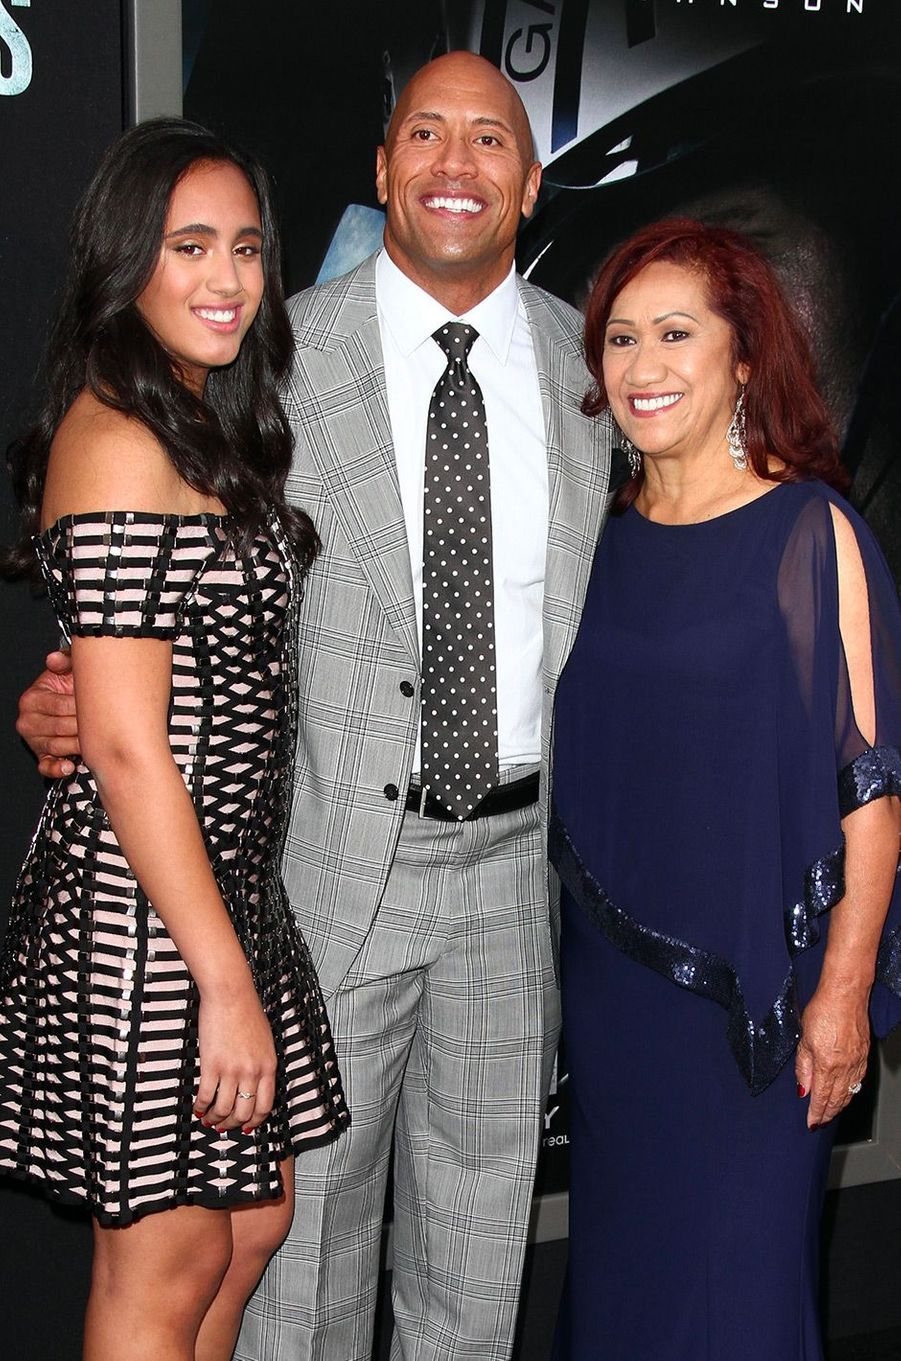 Simone Garcia Johnson, son père Dwayne Johnson et sa grand-mère Ata Johnson à Hollywood le 26 mai 2015